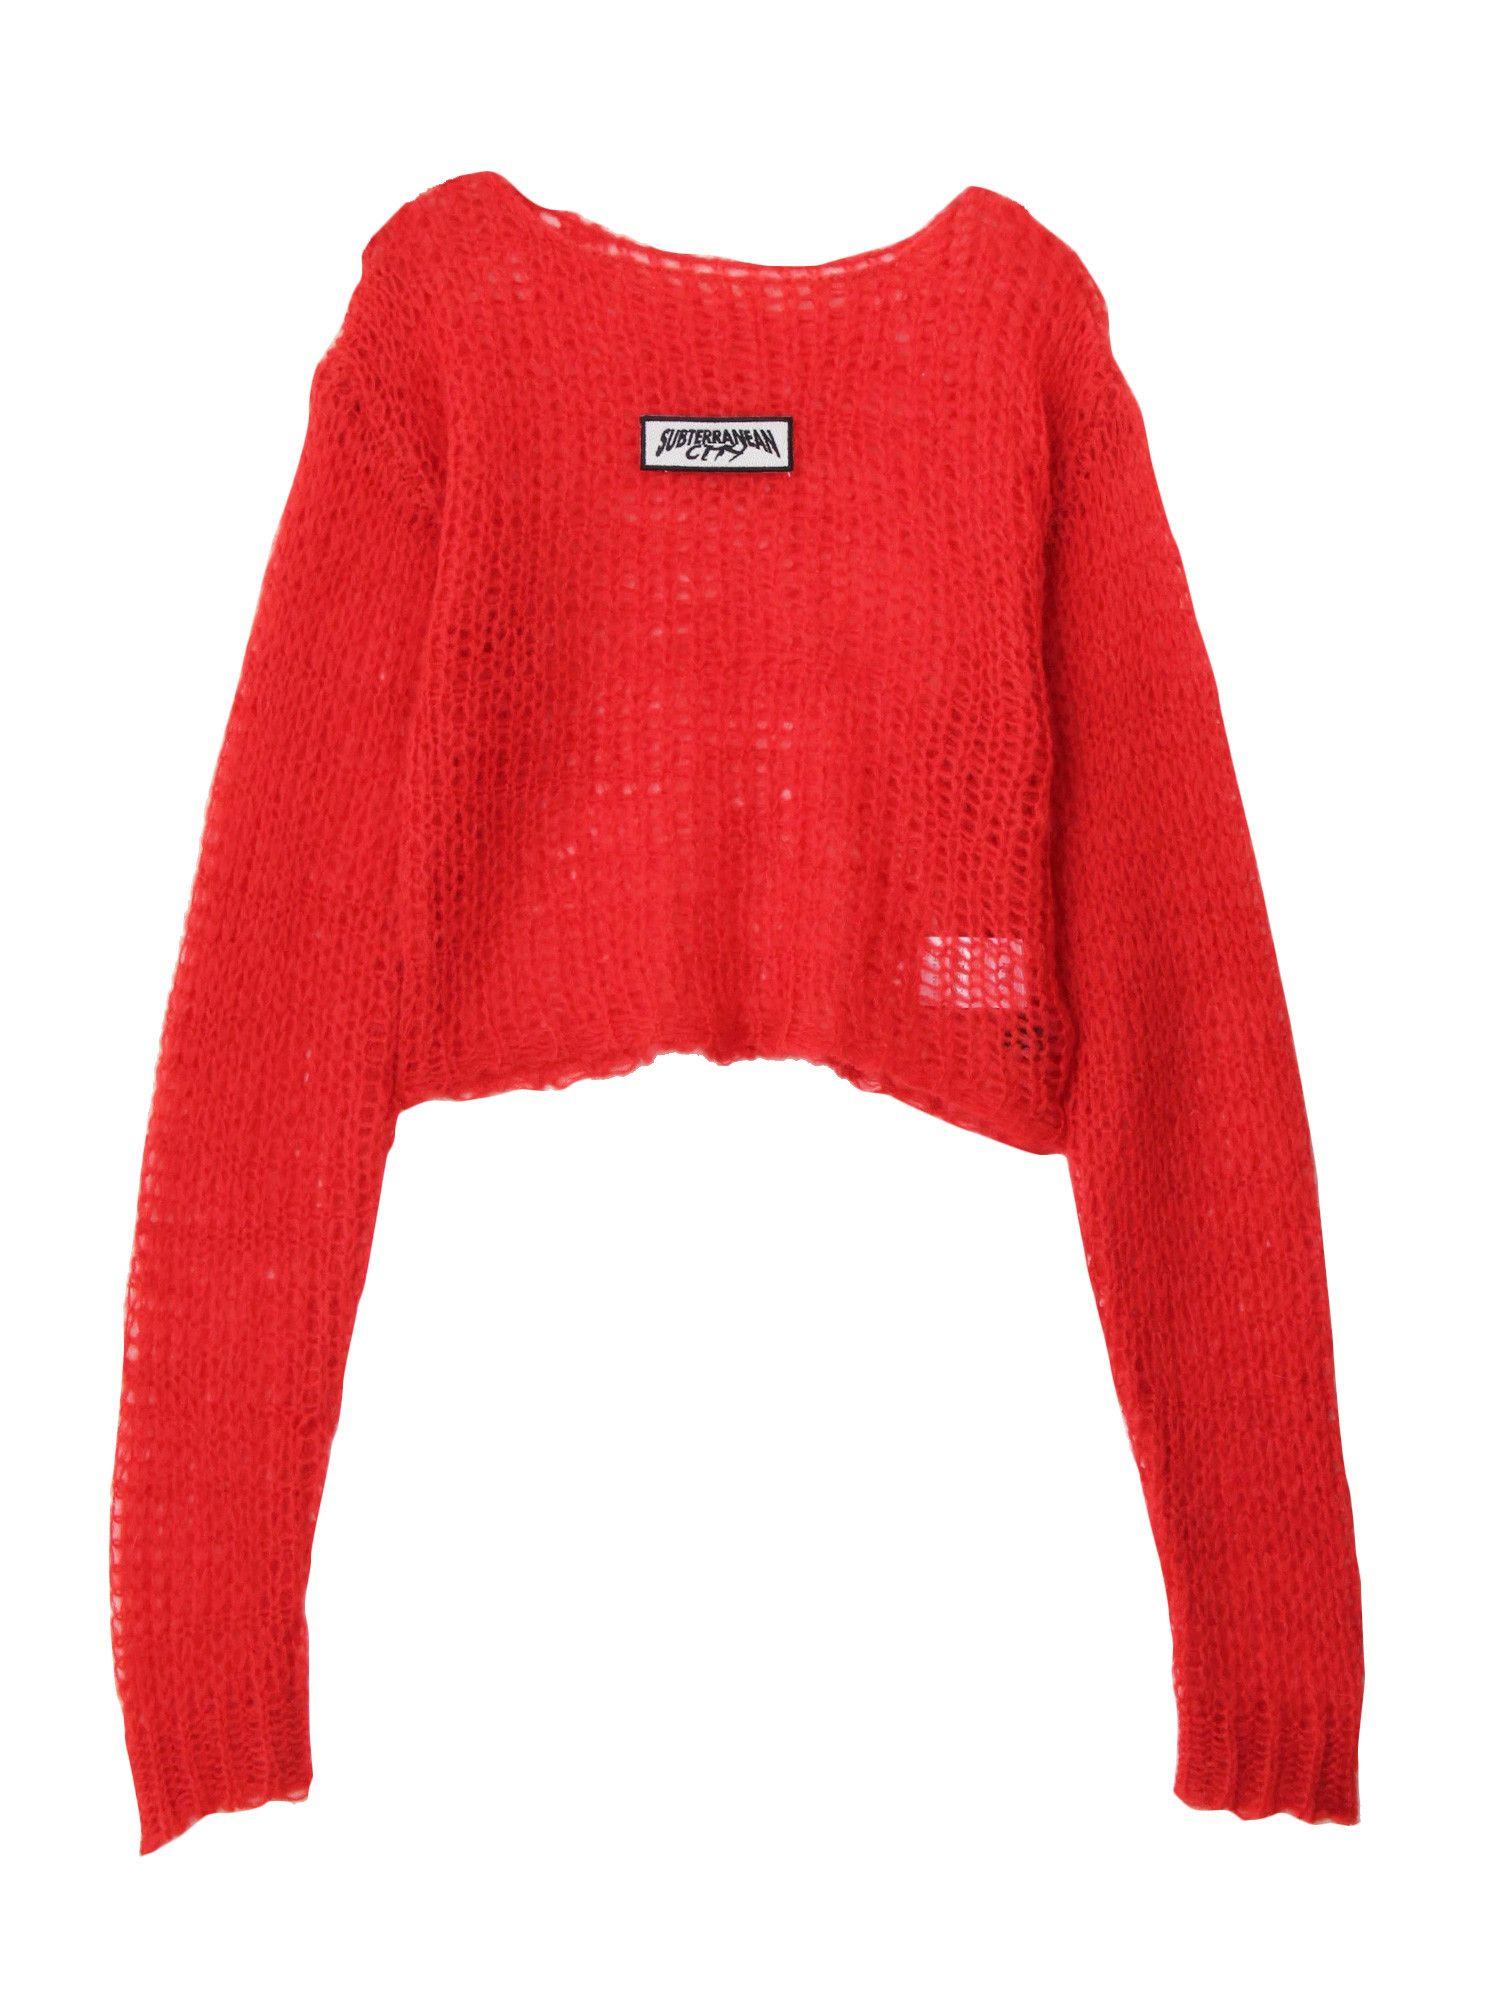 Mohair 90's Knit Top